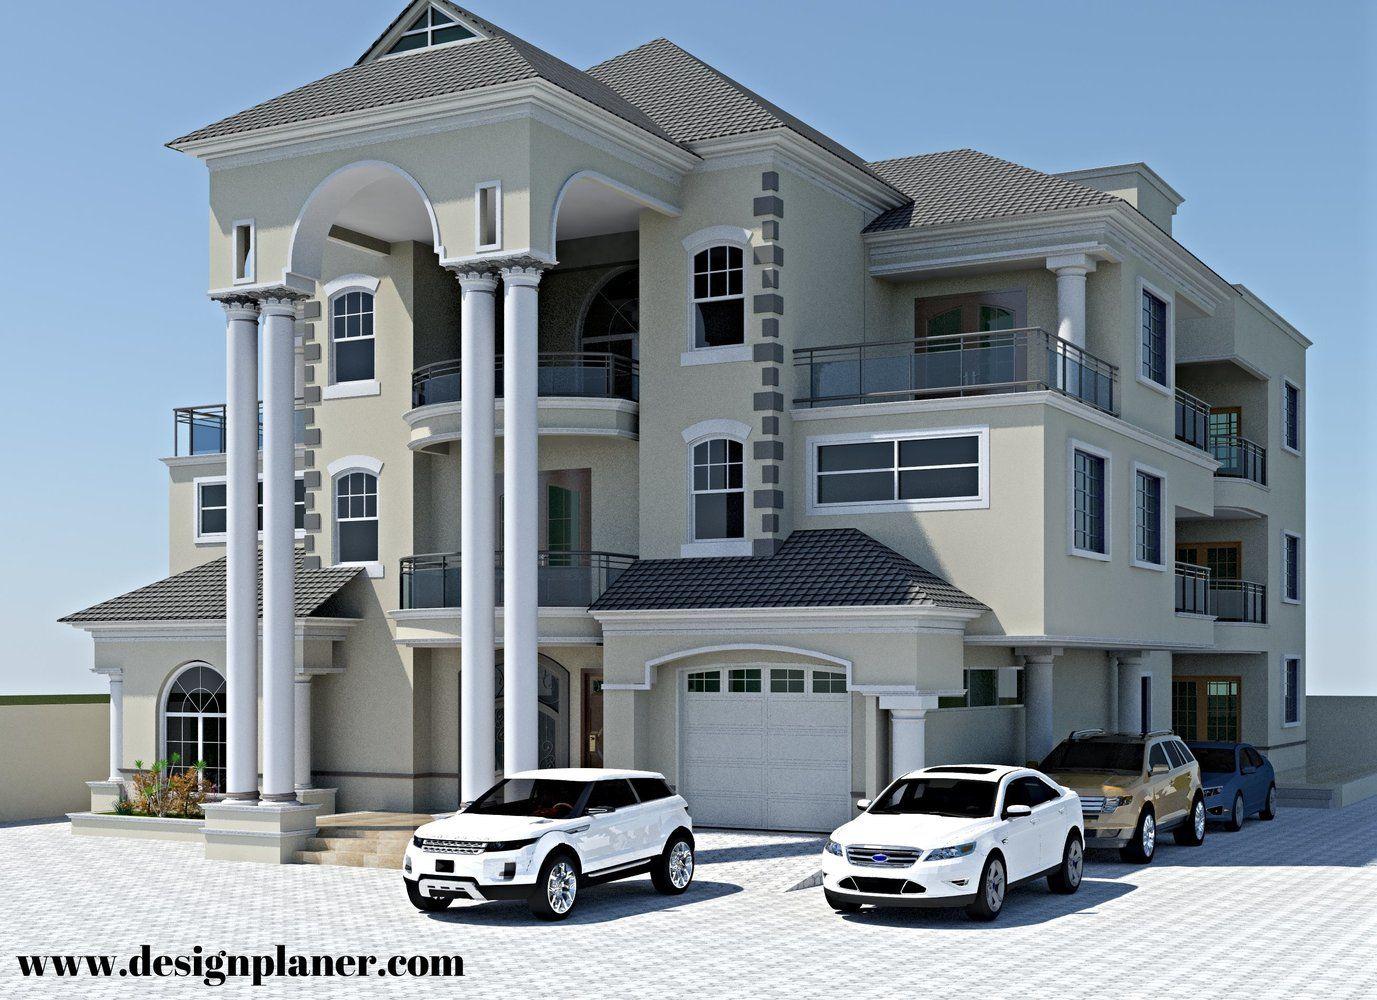 10 Bedroom House Architect design house, House plans